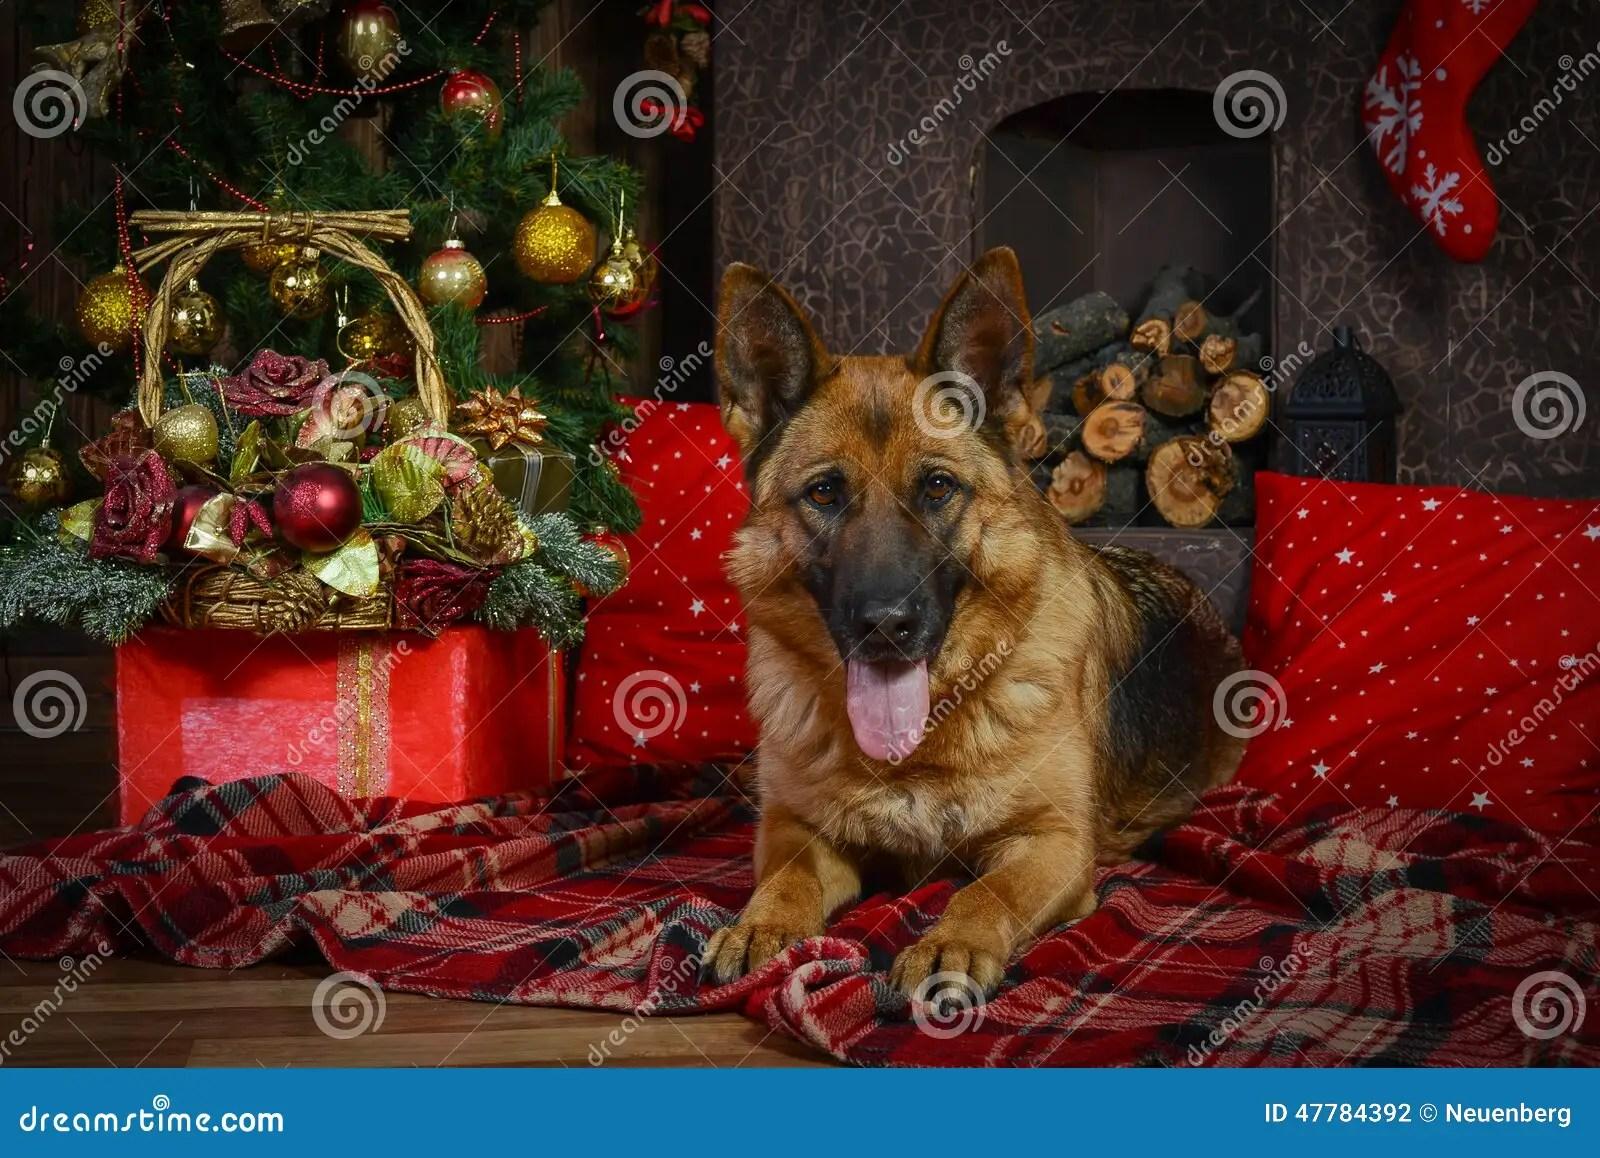 German Shepherd Dog For Christmas Stock Photo Image